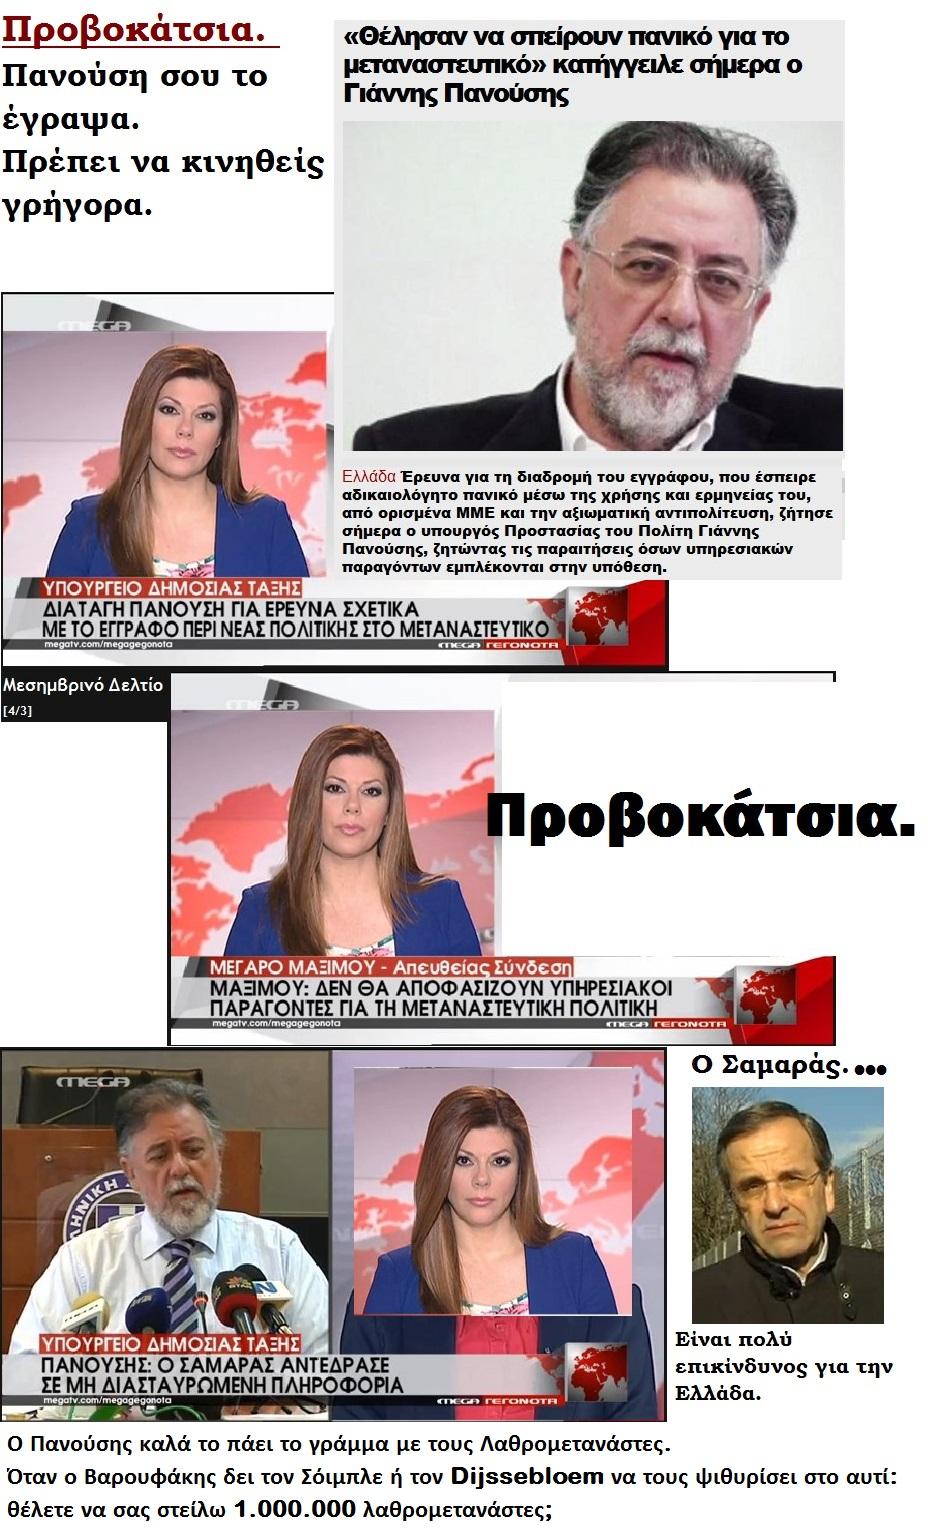 ELLADA SYRIZA PANOUSHS METANASTEYSH SAMARAS SYRIZA 01 040315